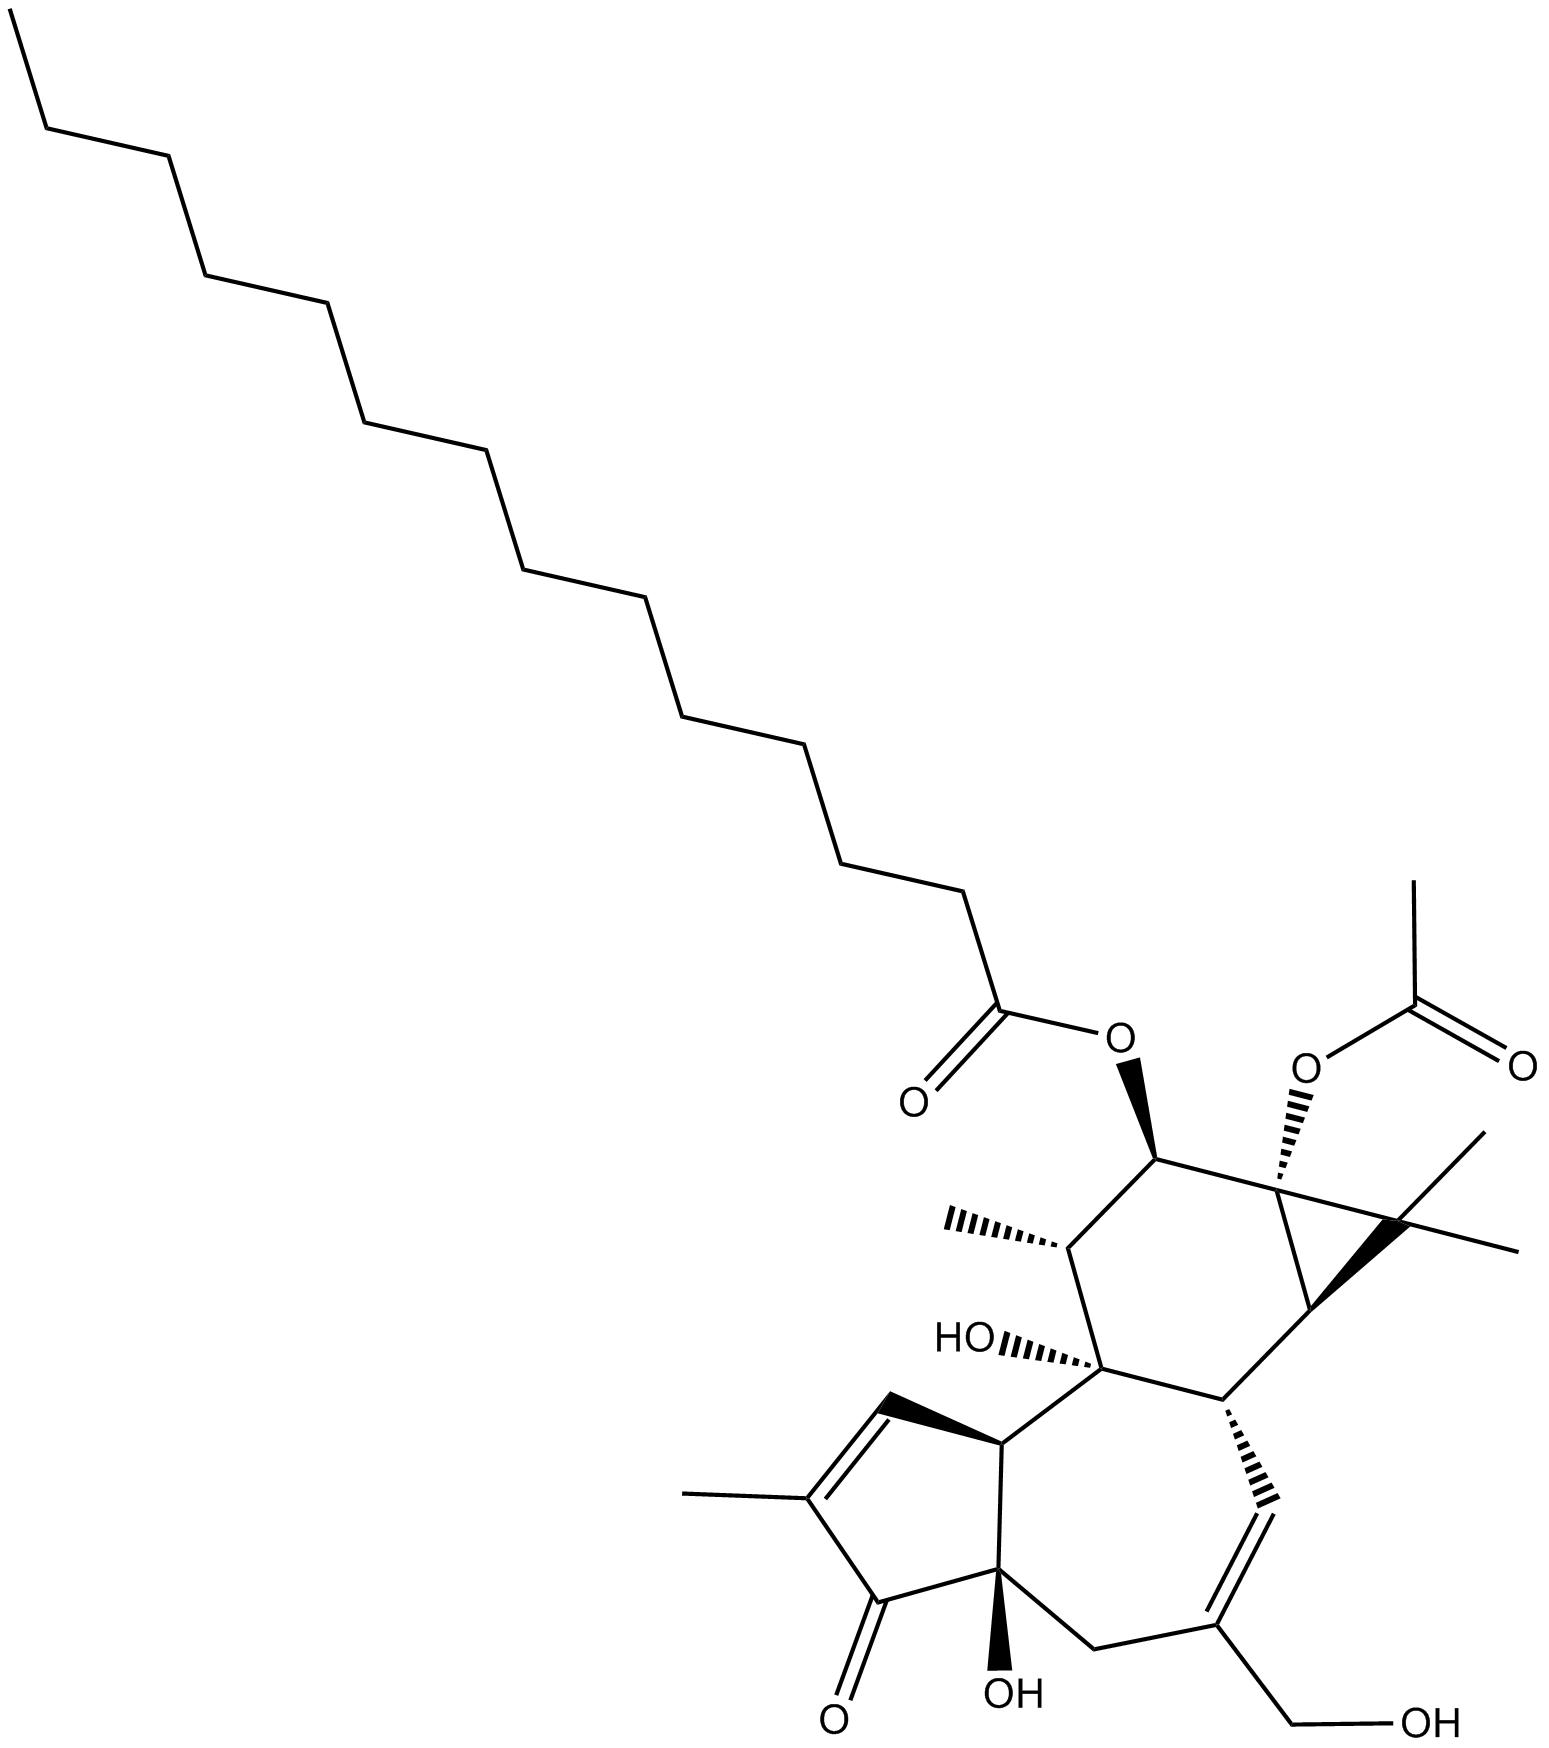 12-O-tetradecanoyl phorbol-13-acetate